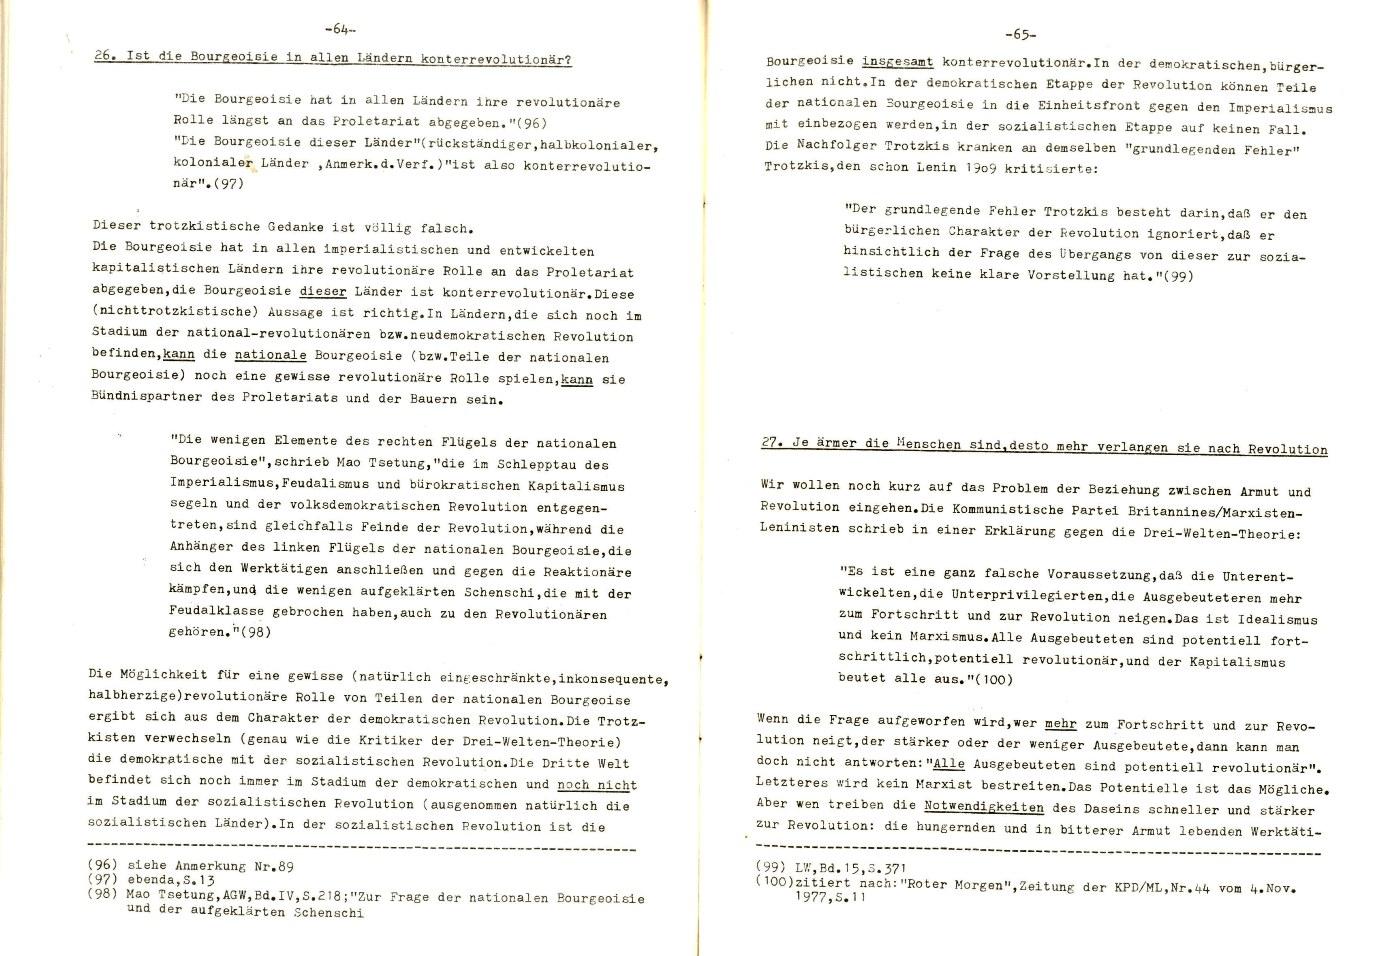 Muenchen_Kampf_dem_Revisionismus_1978_04_05_34